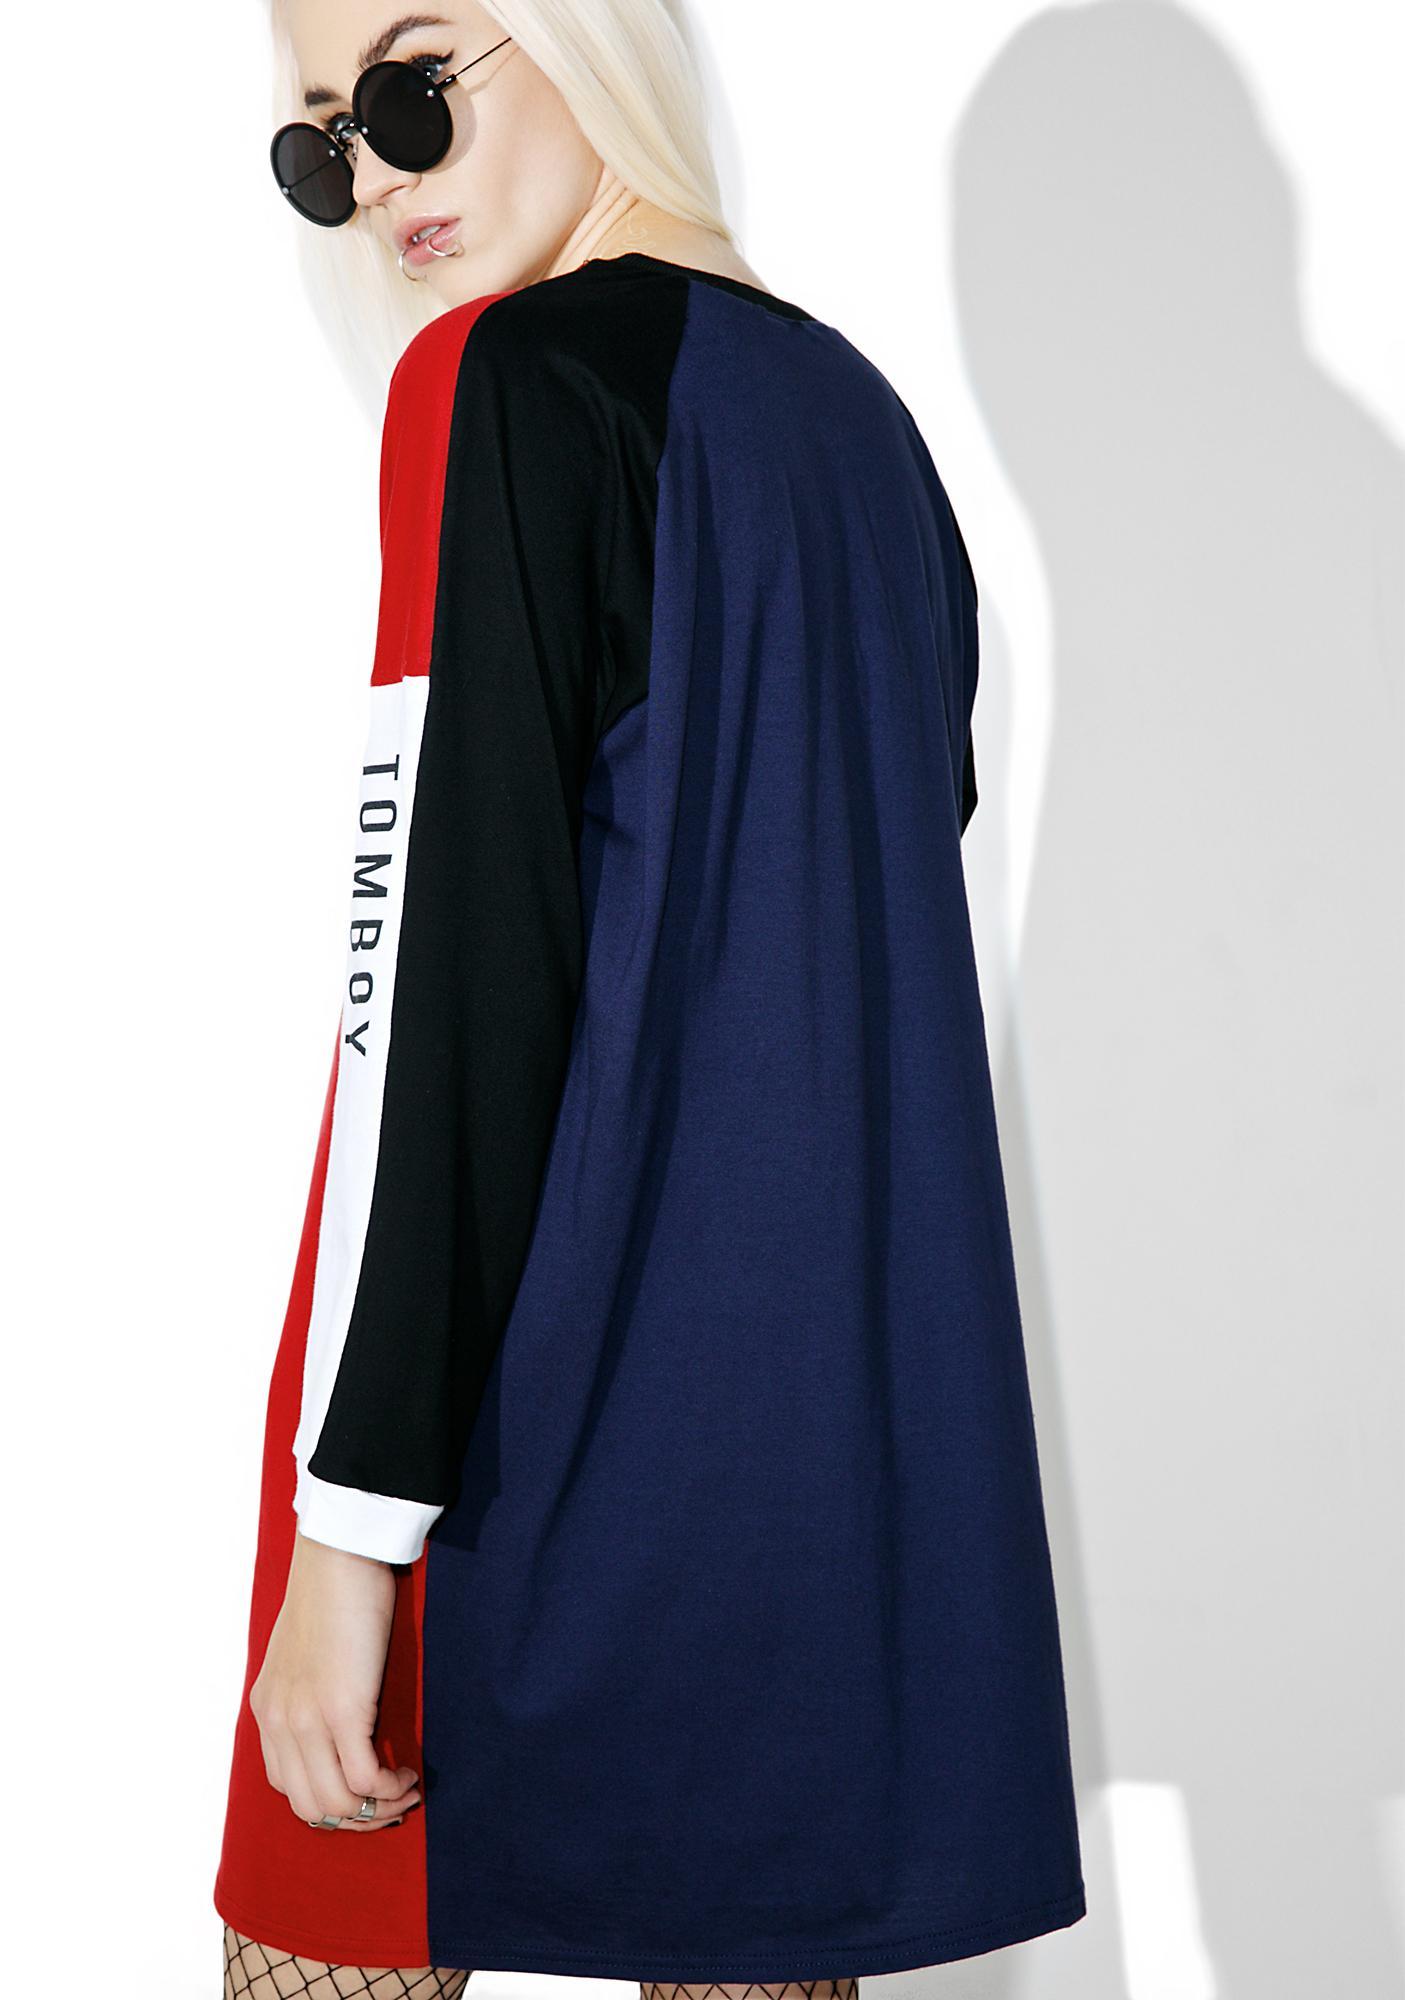 The Ragged Priest Tomboy Dress